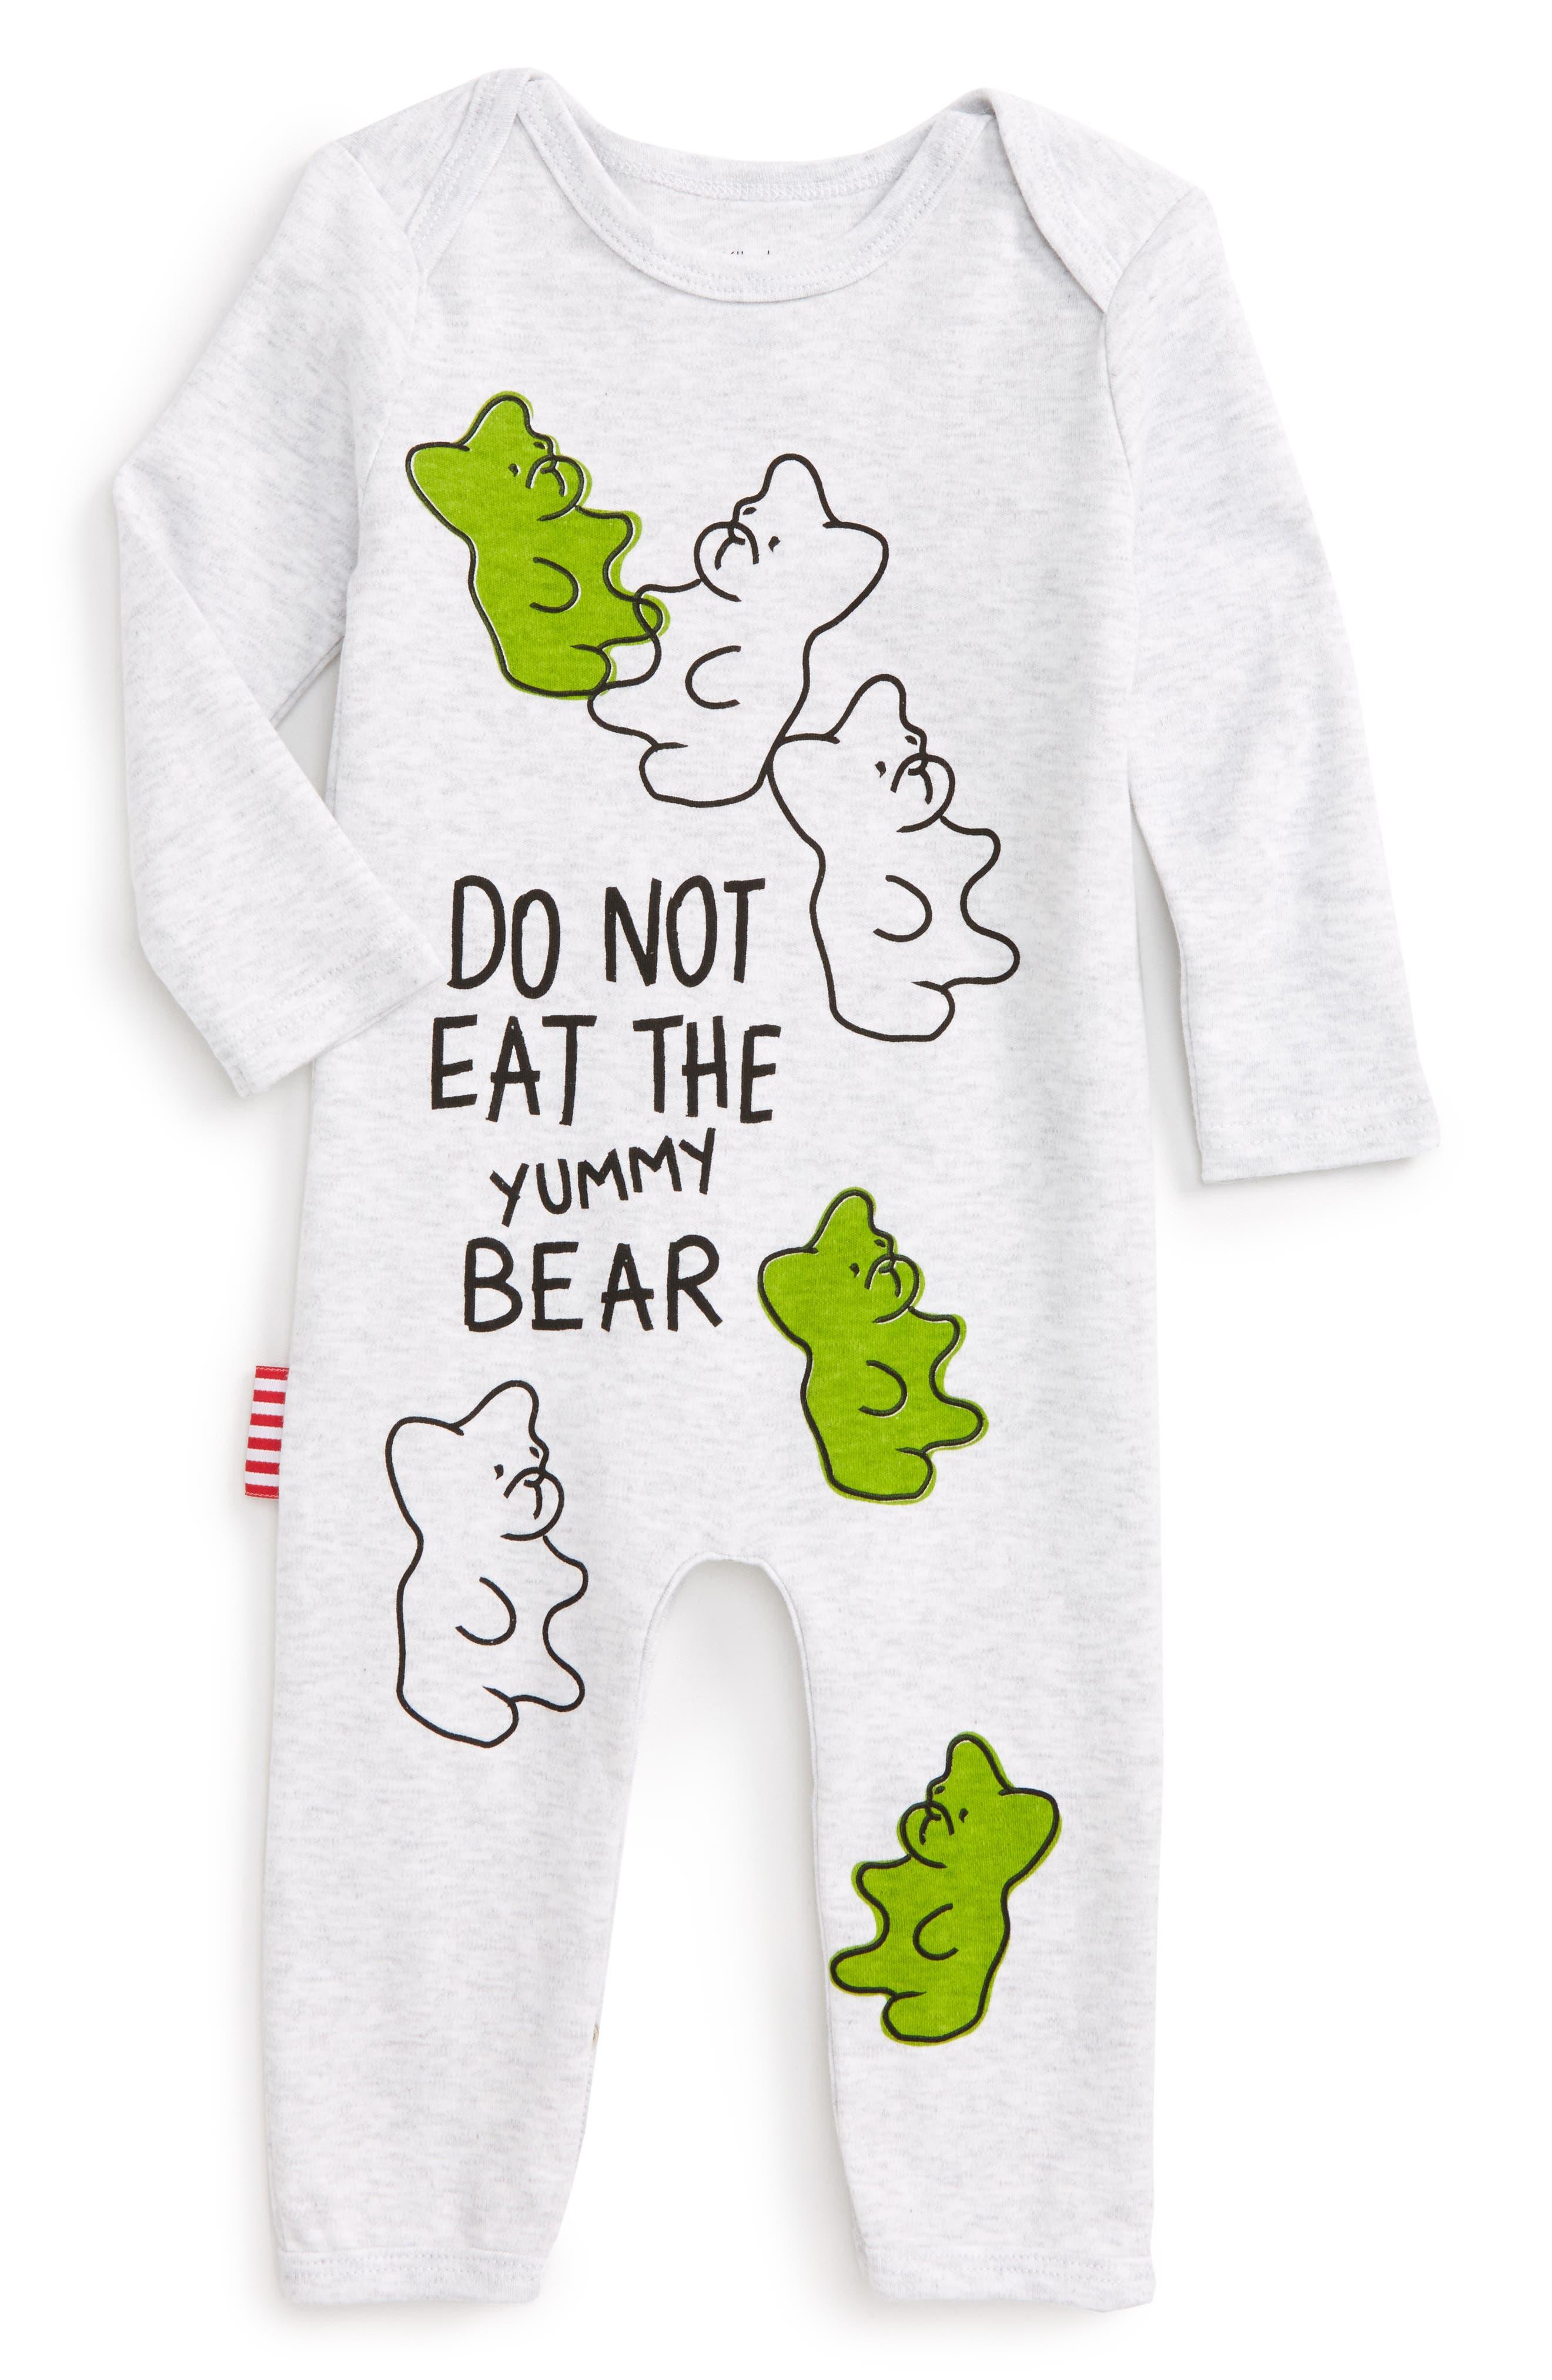 SOOKIbaby Yummy Bear Romper (Baby)